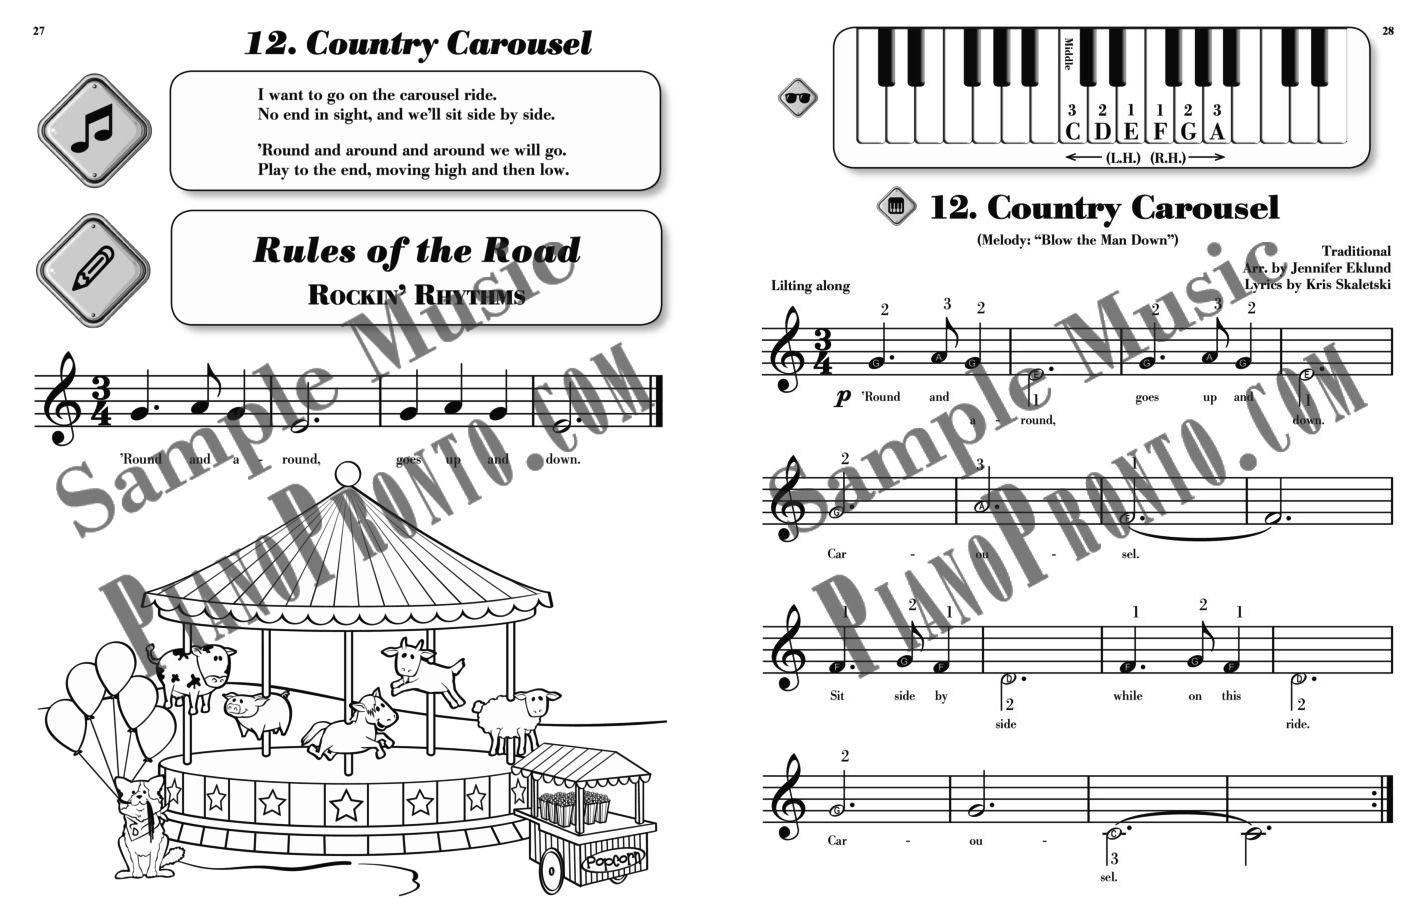 Roadtrip!® Country Carnival